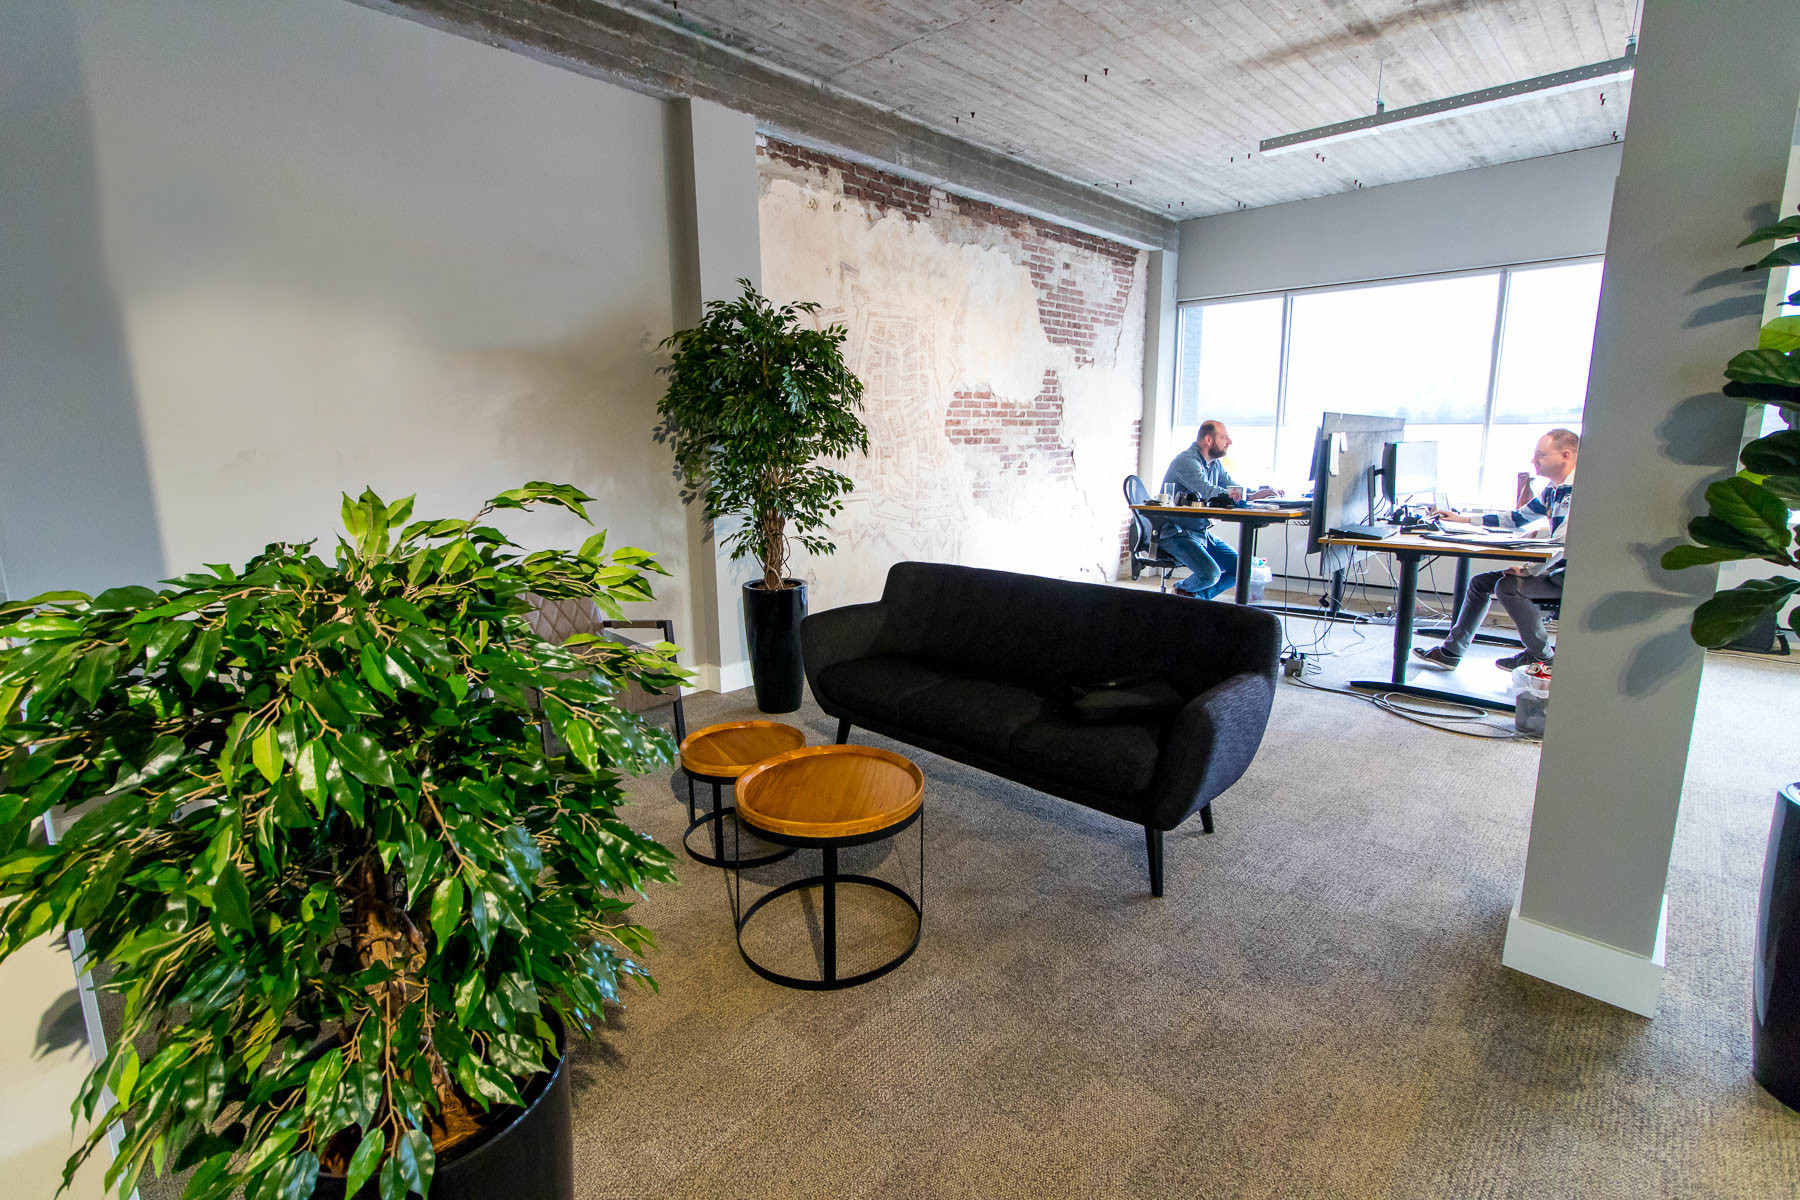 Uniquely designed offices